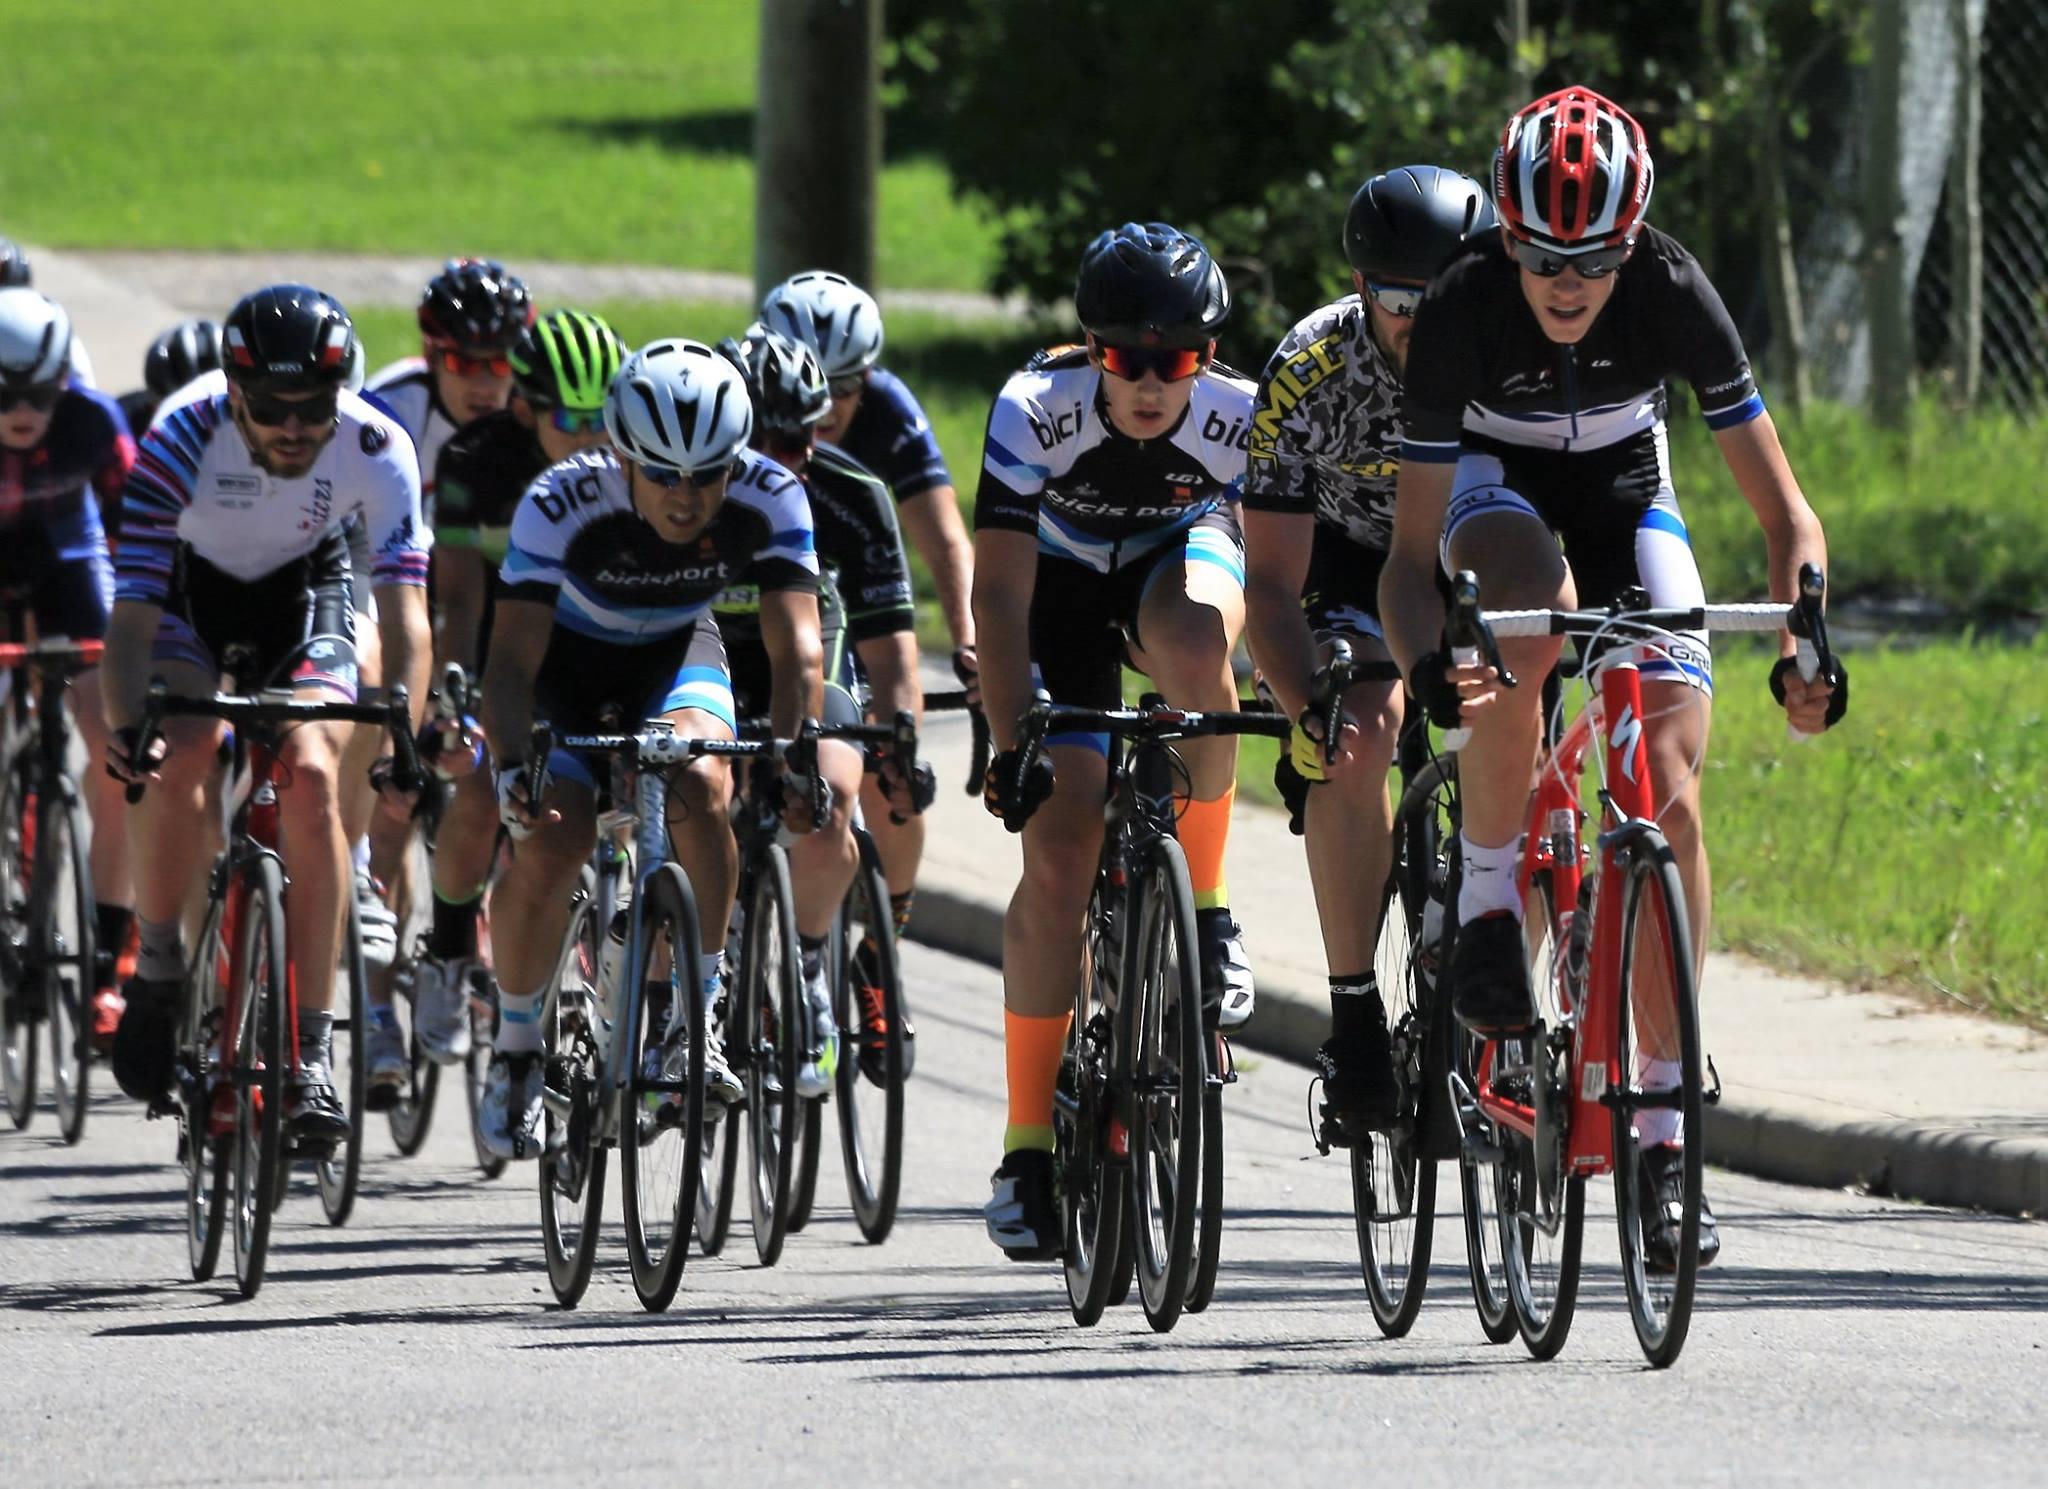 CAT 3 CRIT - Tour de Bowness 2016 - Bici Bucerias Puerto Vallarta Cycling Tours & Bike Rentals